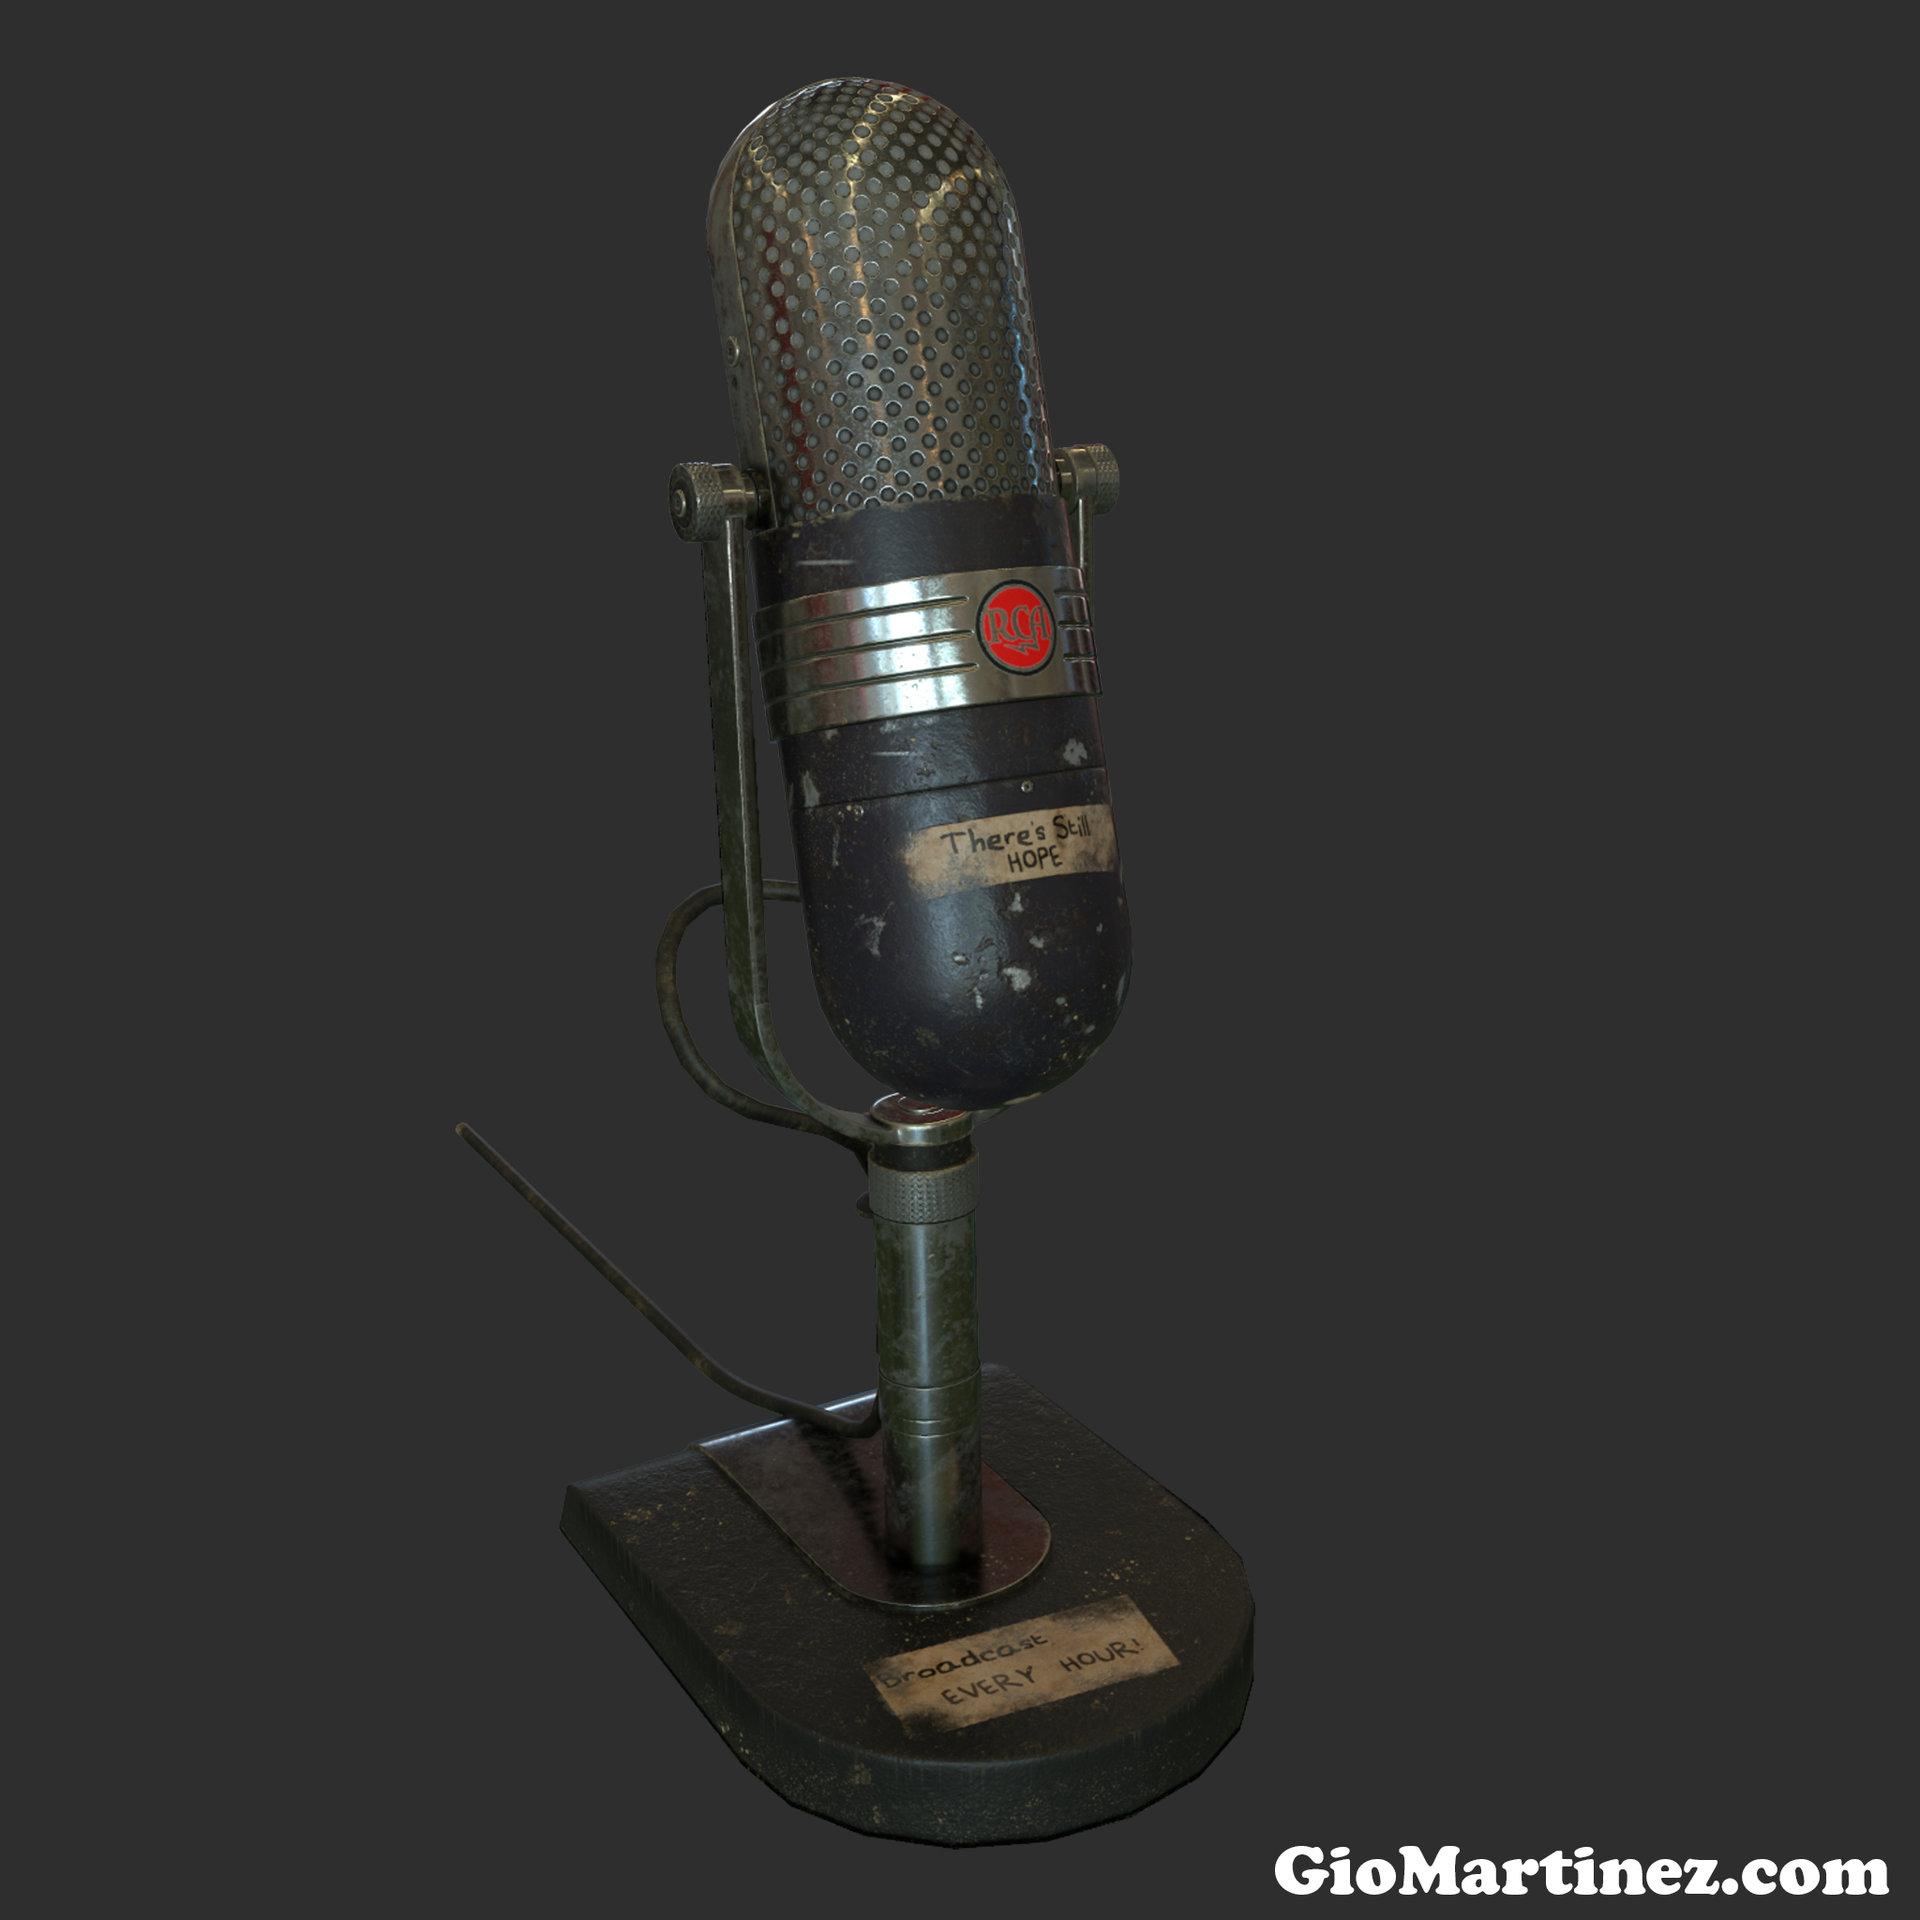 giovanni-martinez-radio-mic-final.jpg?1431045185